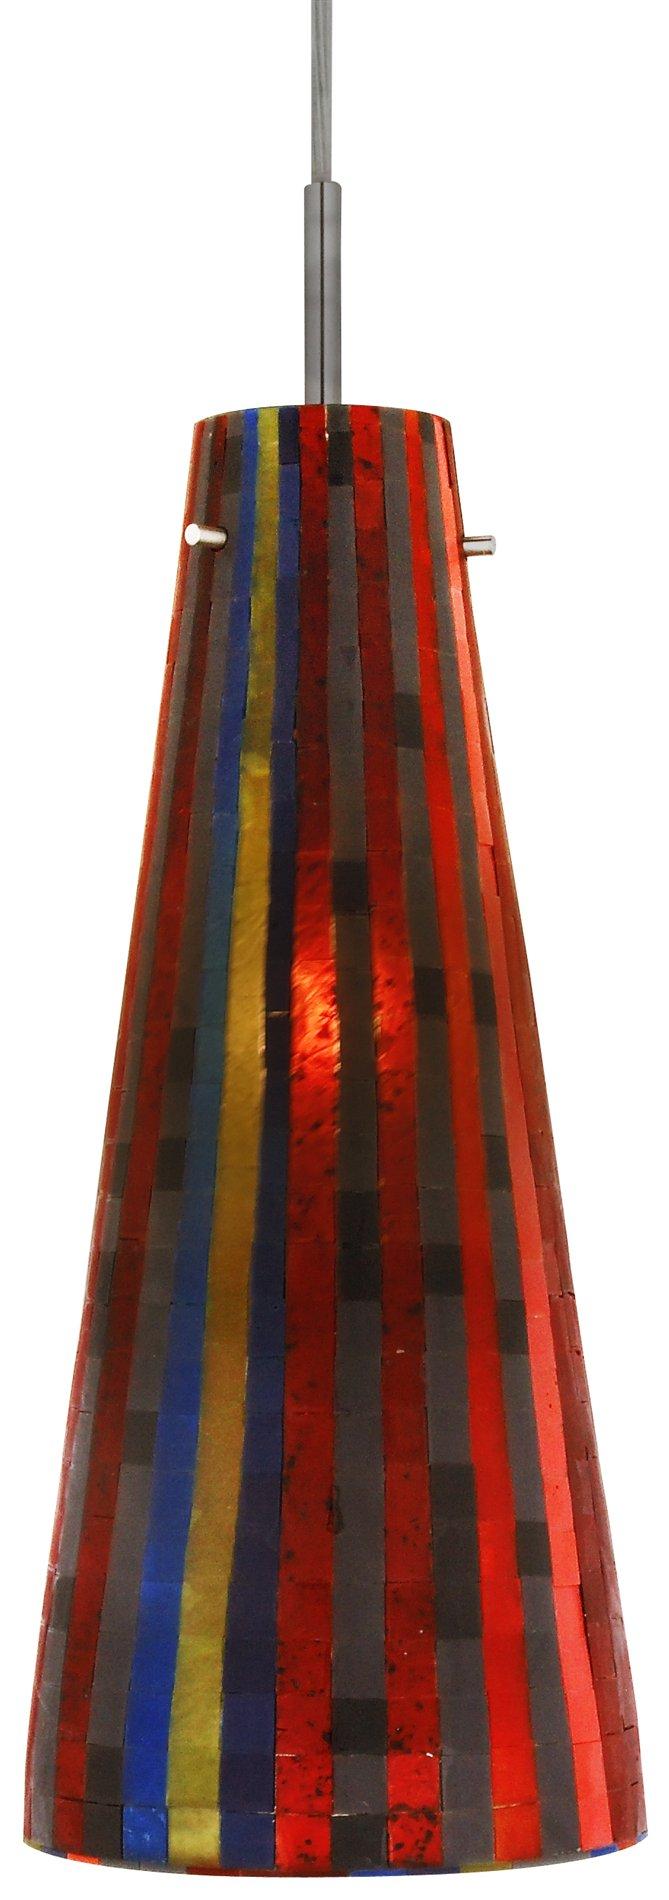 Oggetti 70 mosaic small fry modern contemporary pendant light ogt 70 2665 madison aloadofball Choice Image